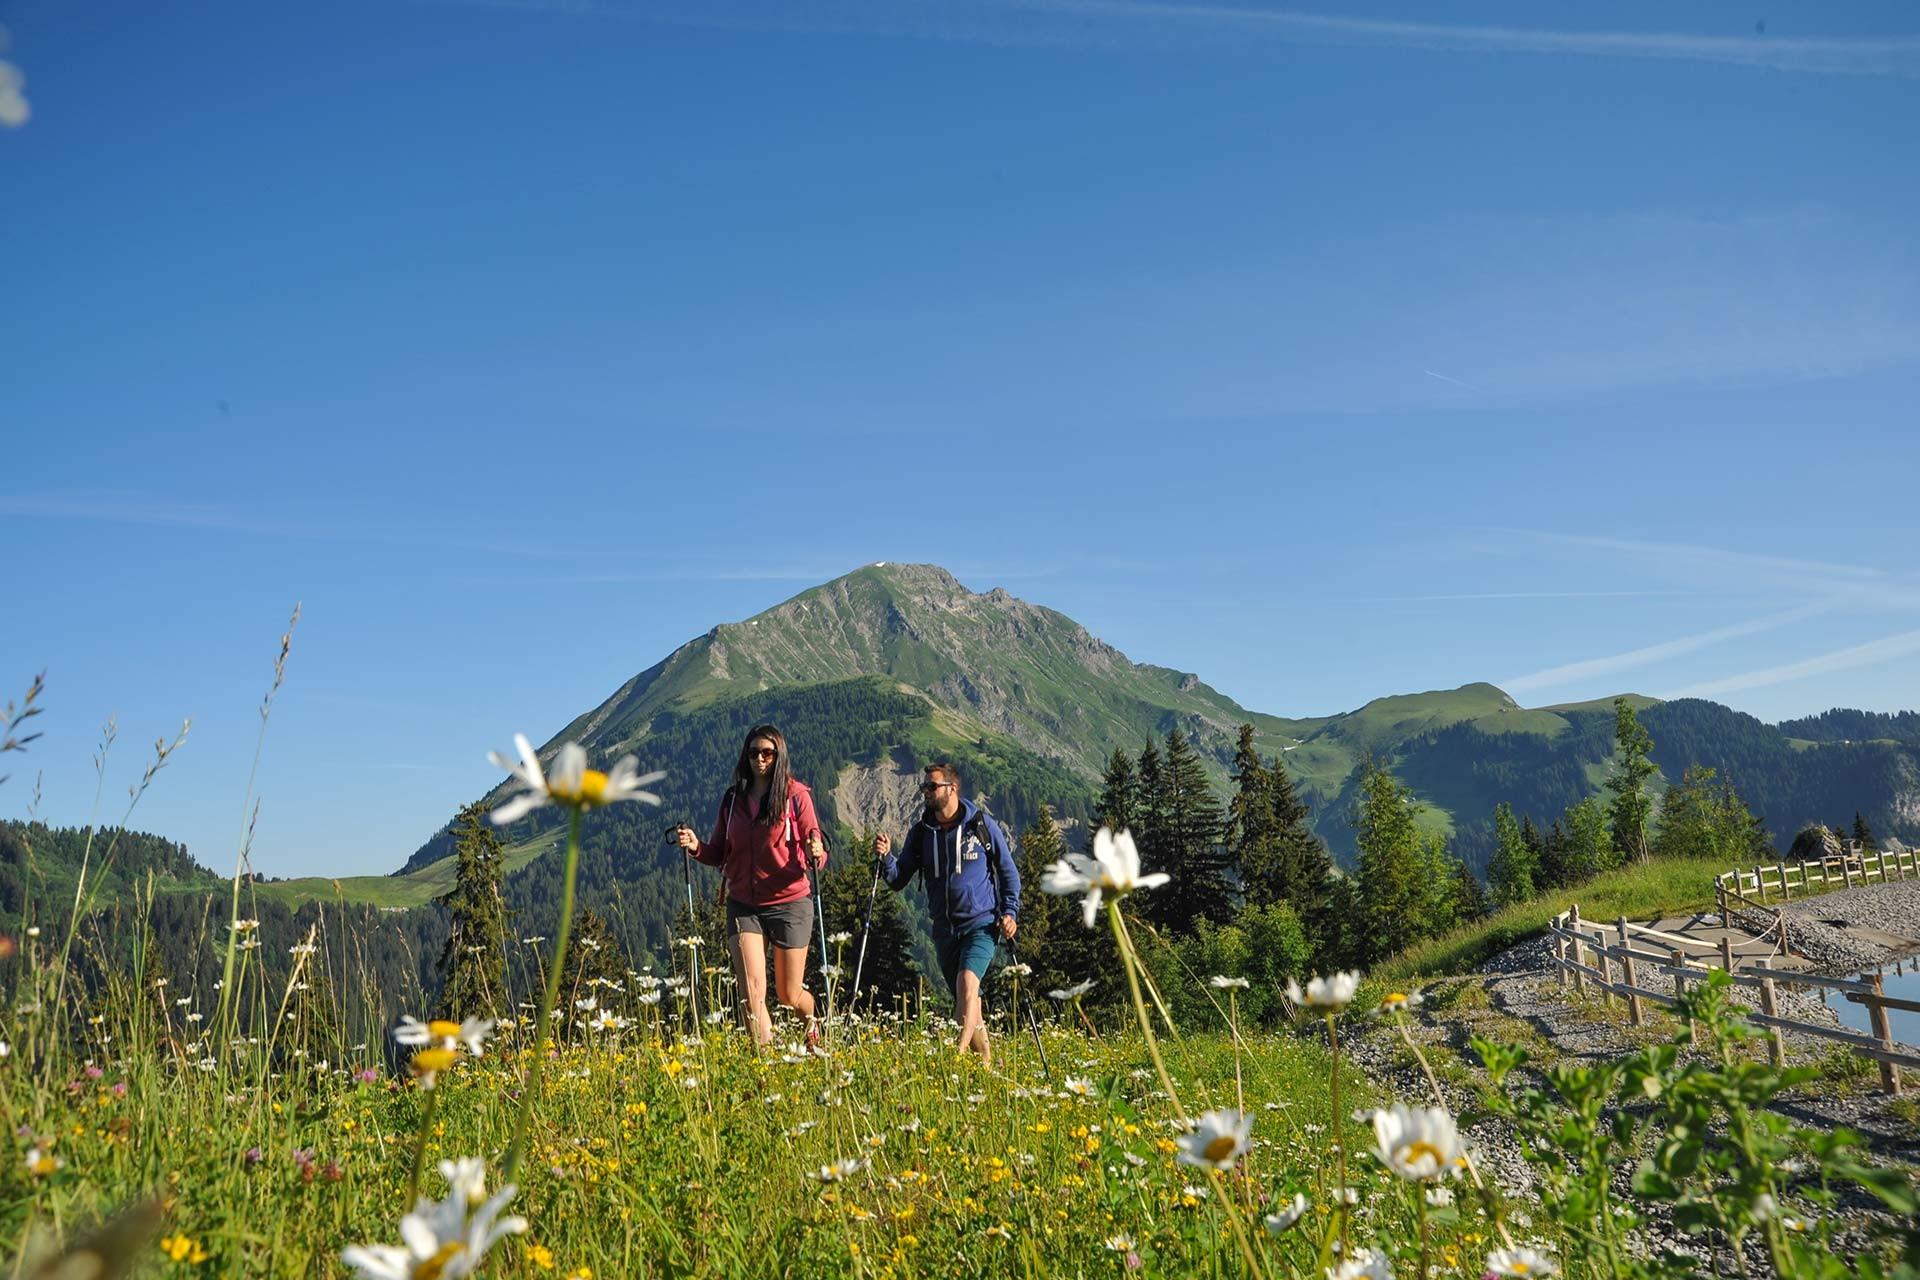 Mountain & Hiking